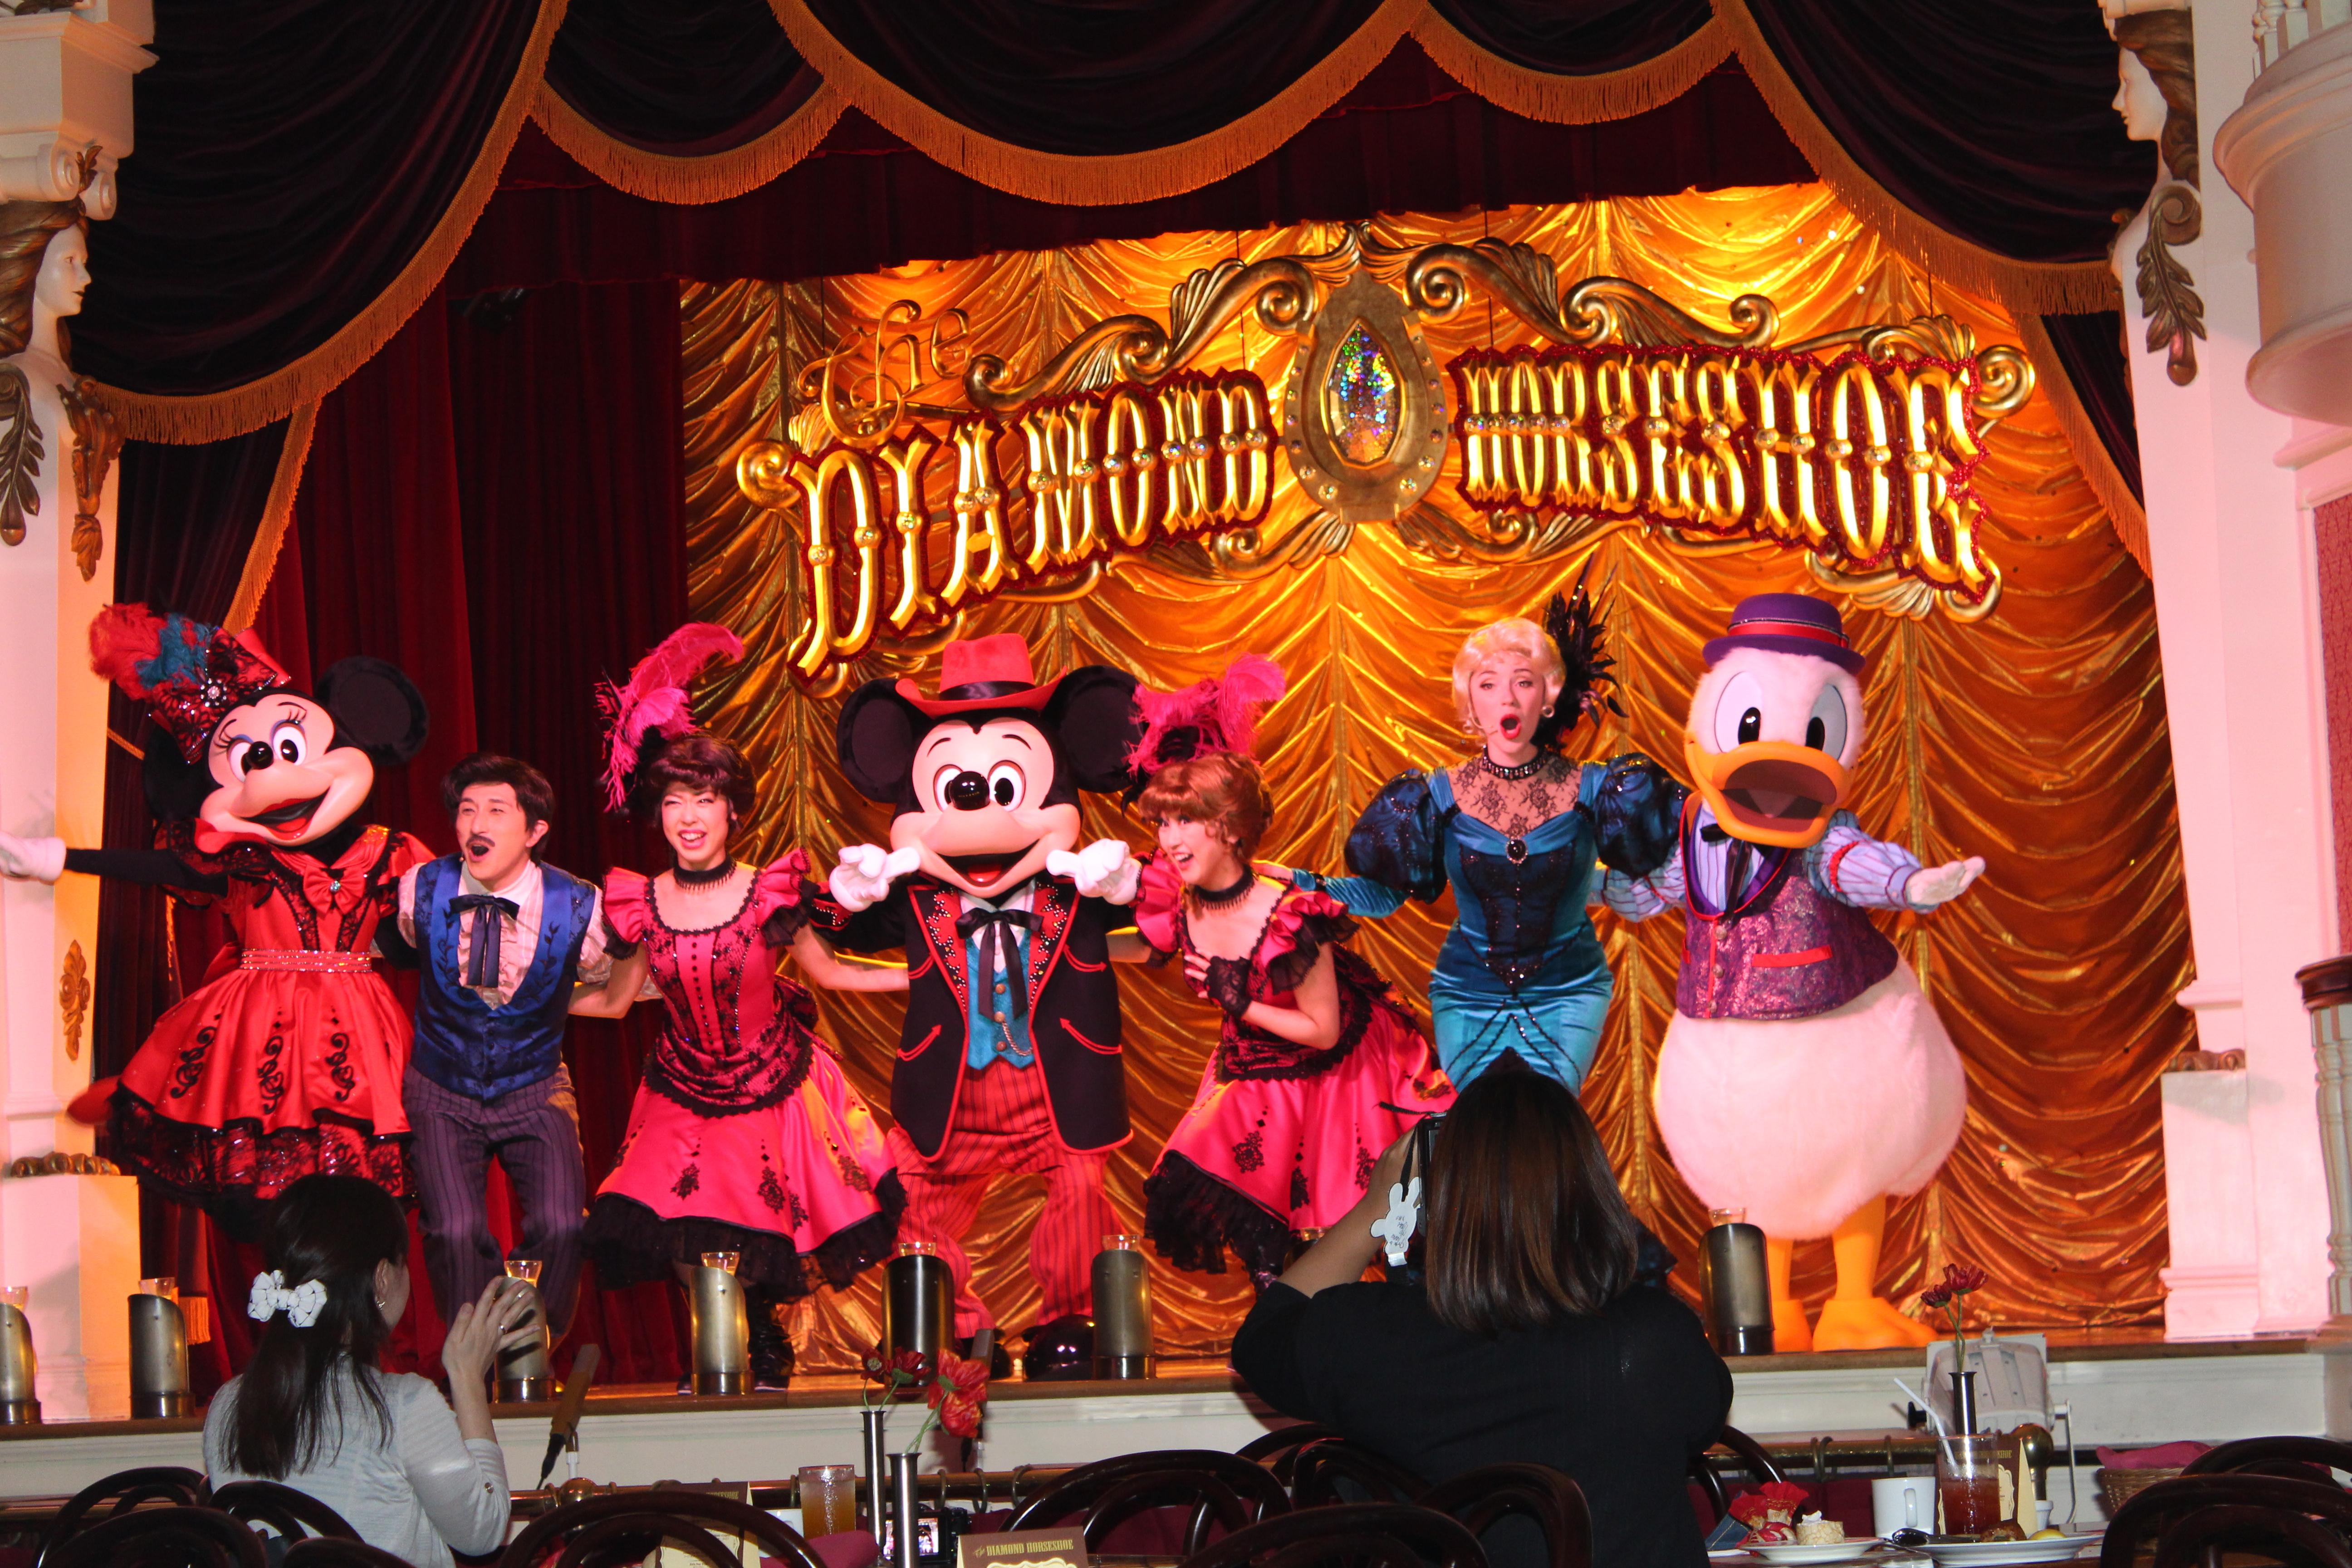 Mickey, Minnie, and Donald